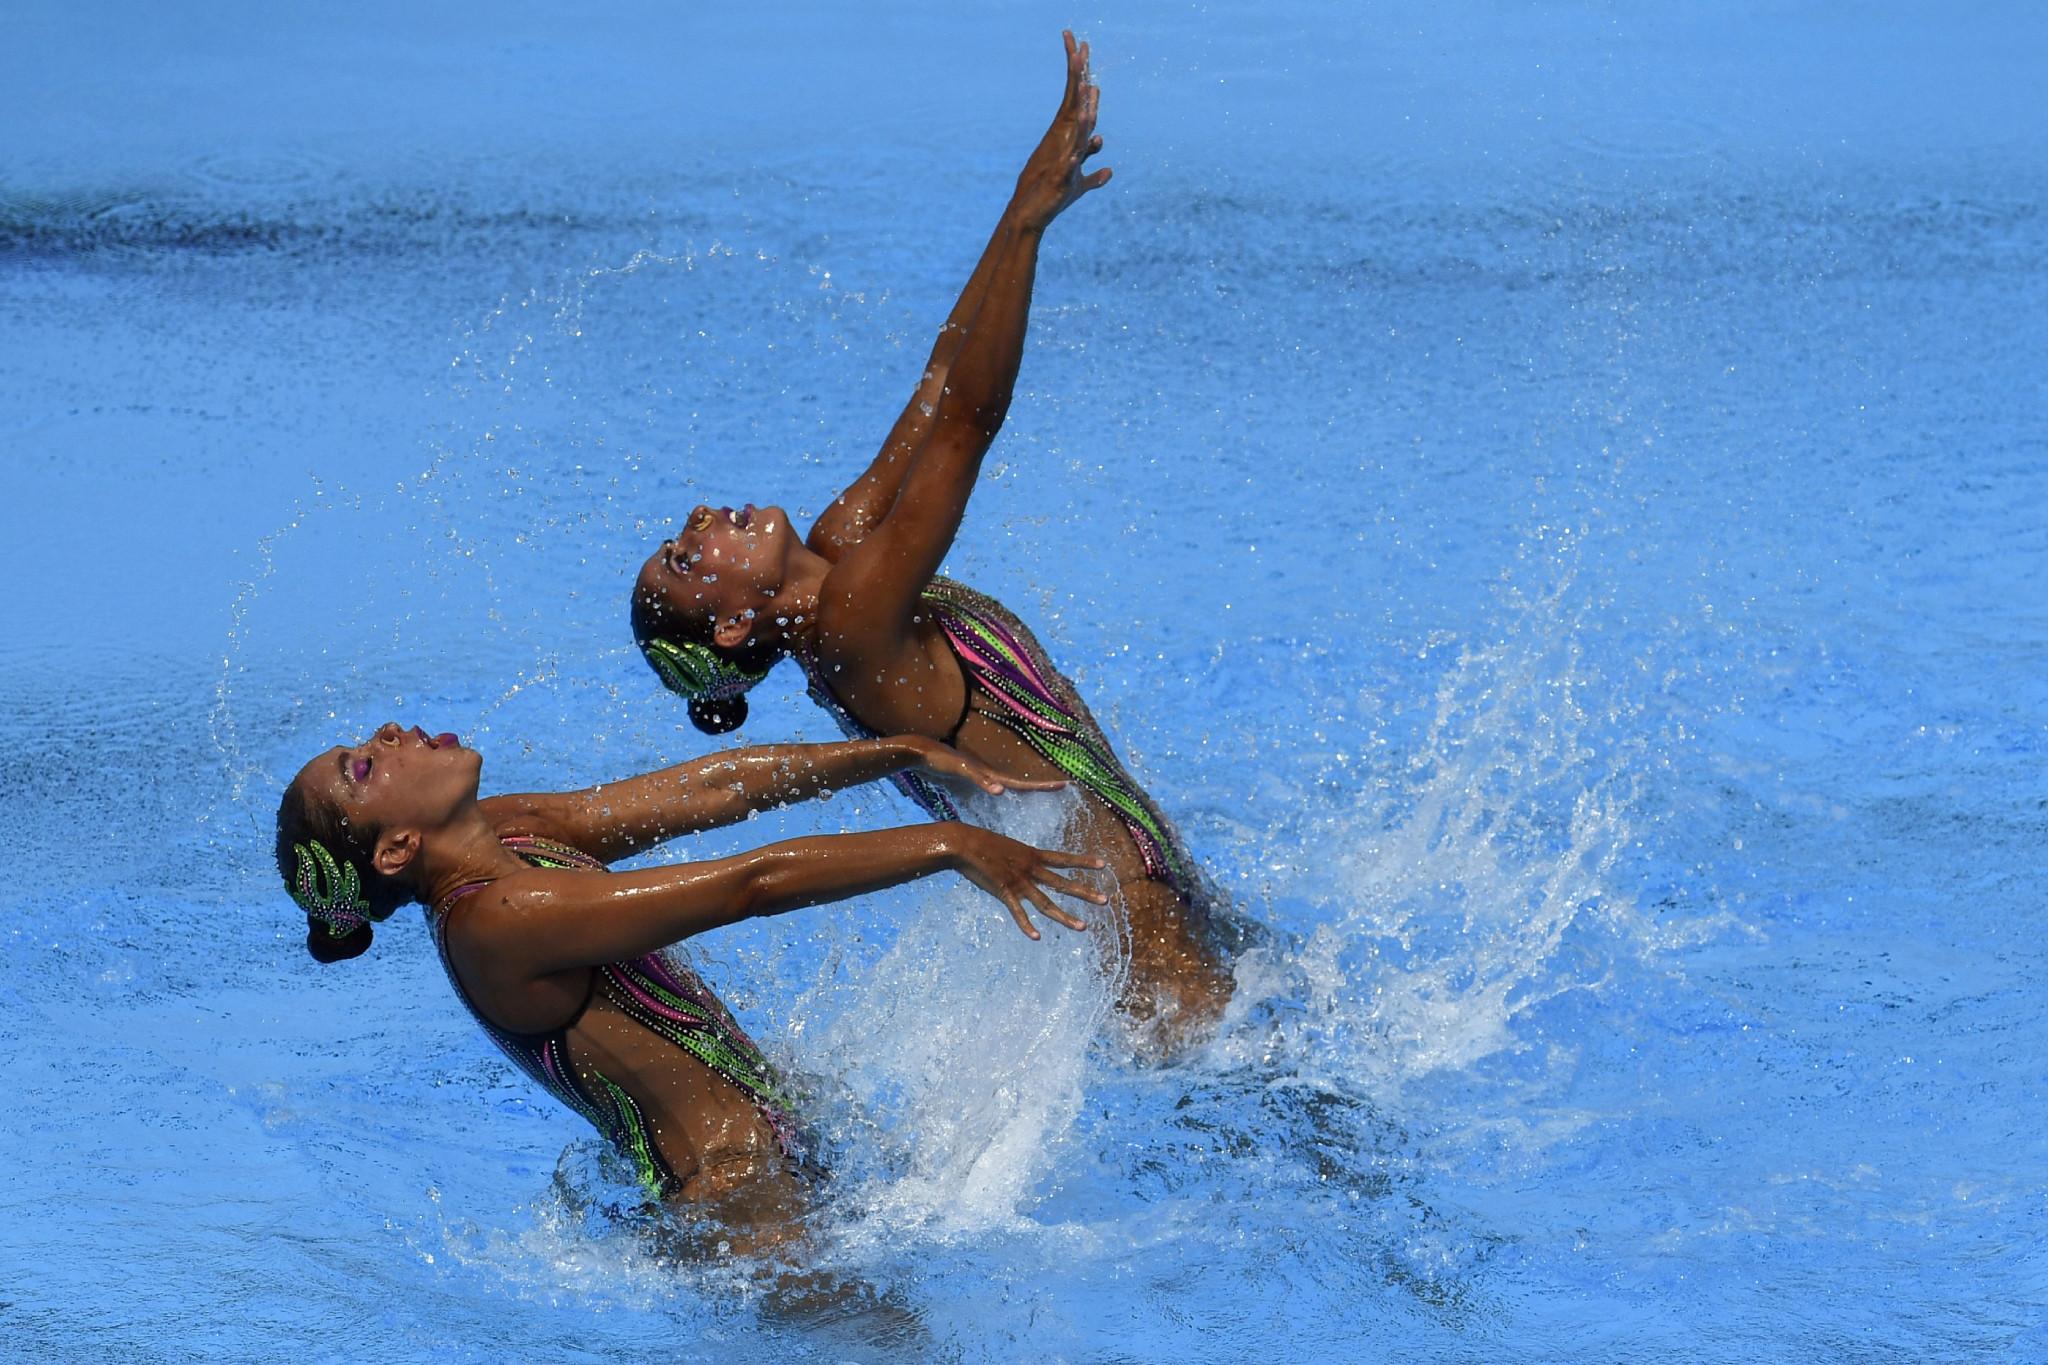 Mexico's Karem Achach and Nuria Diosdado Garcia won the technical duet event ©Getty Images